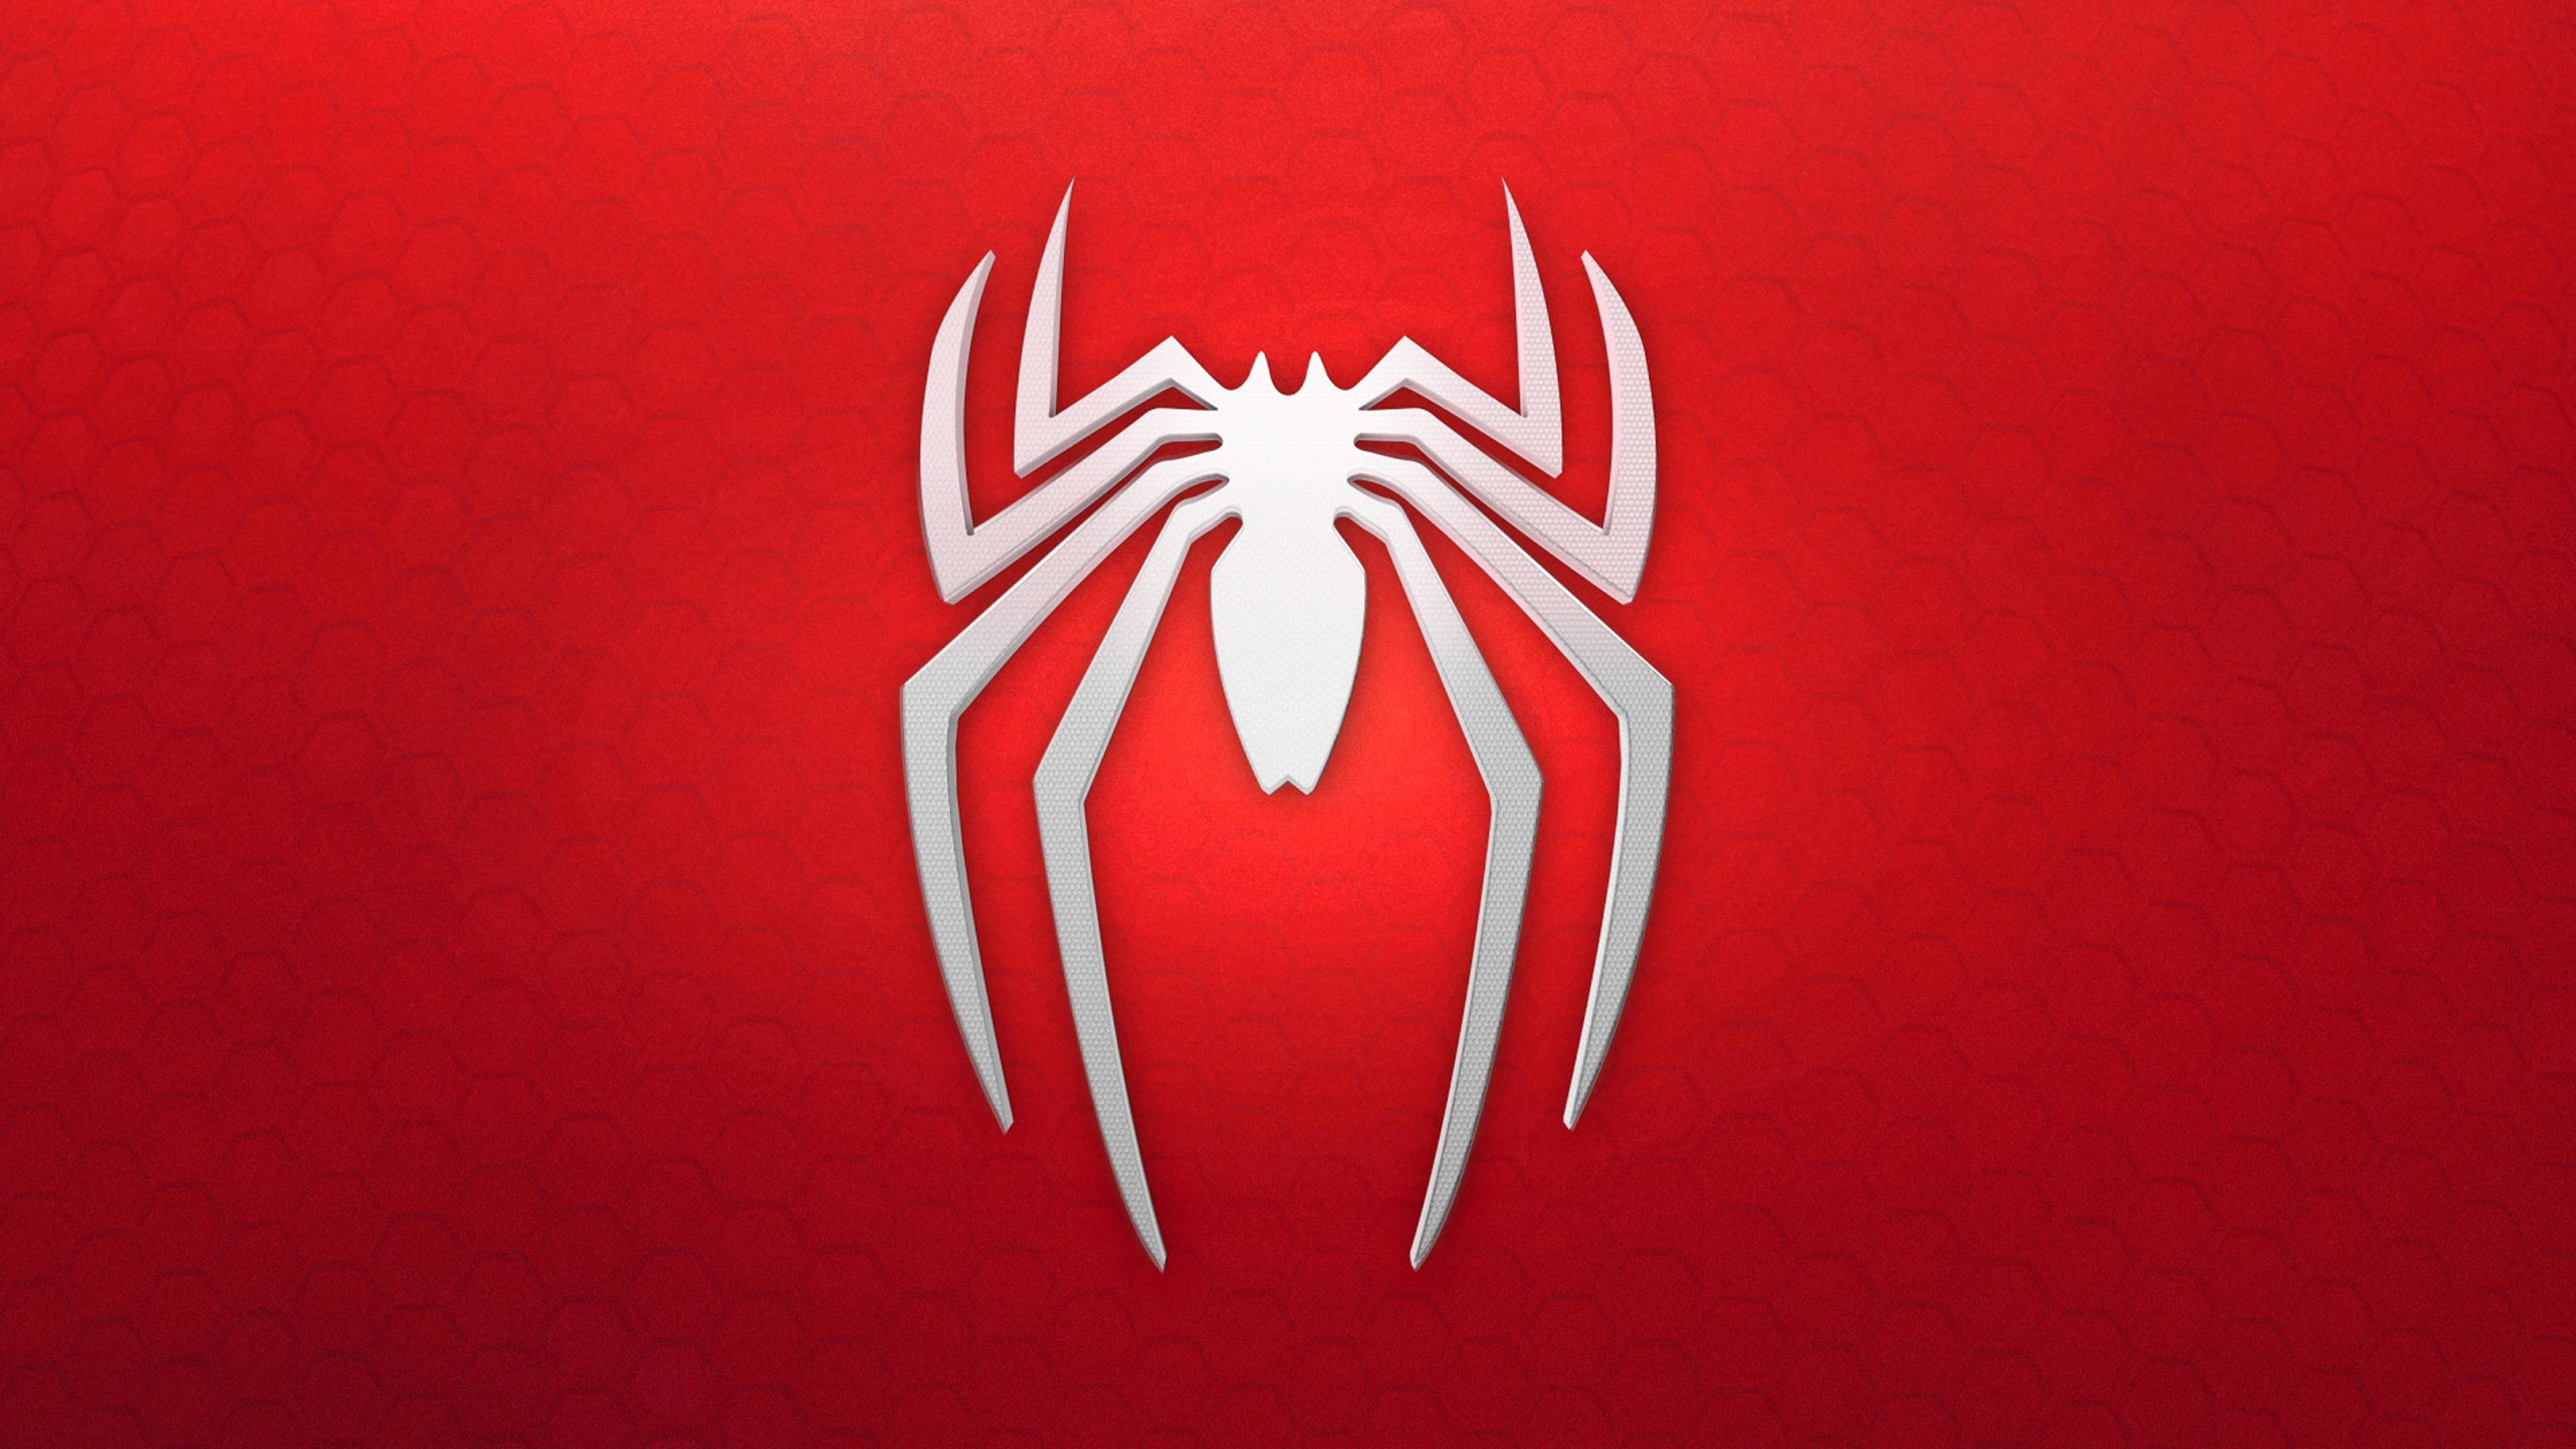 Spider-Man: Homecoming 4K Logo wallpaper